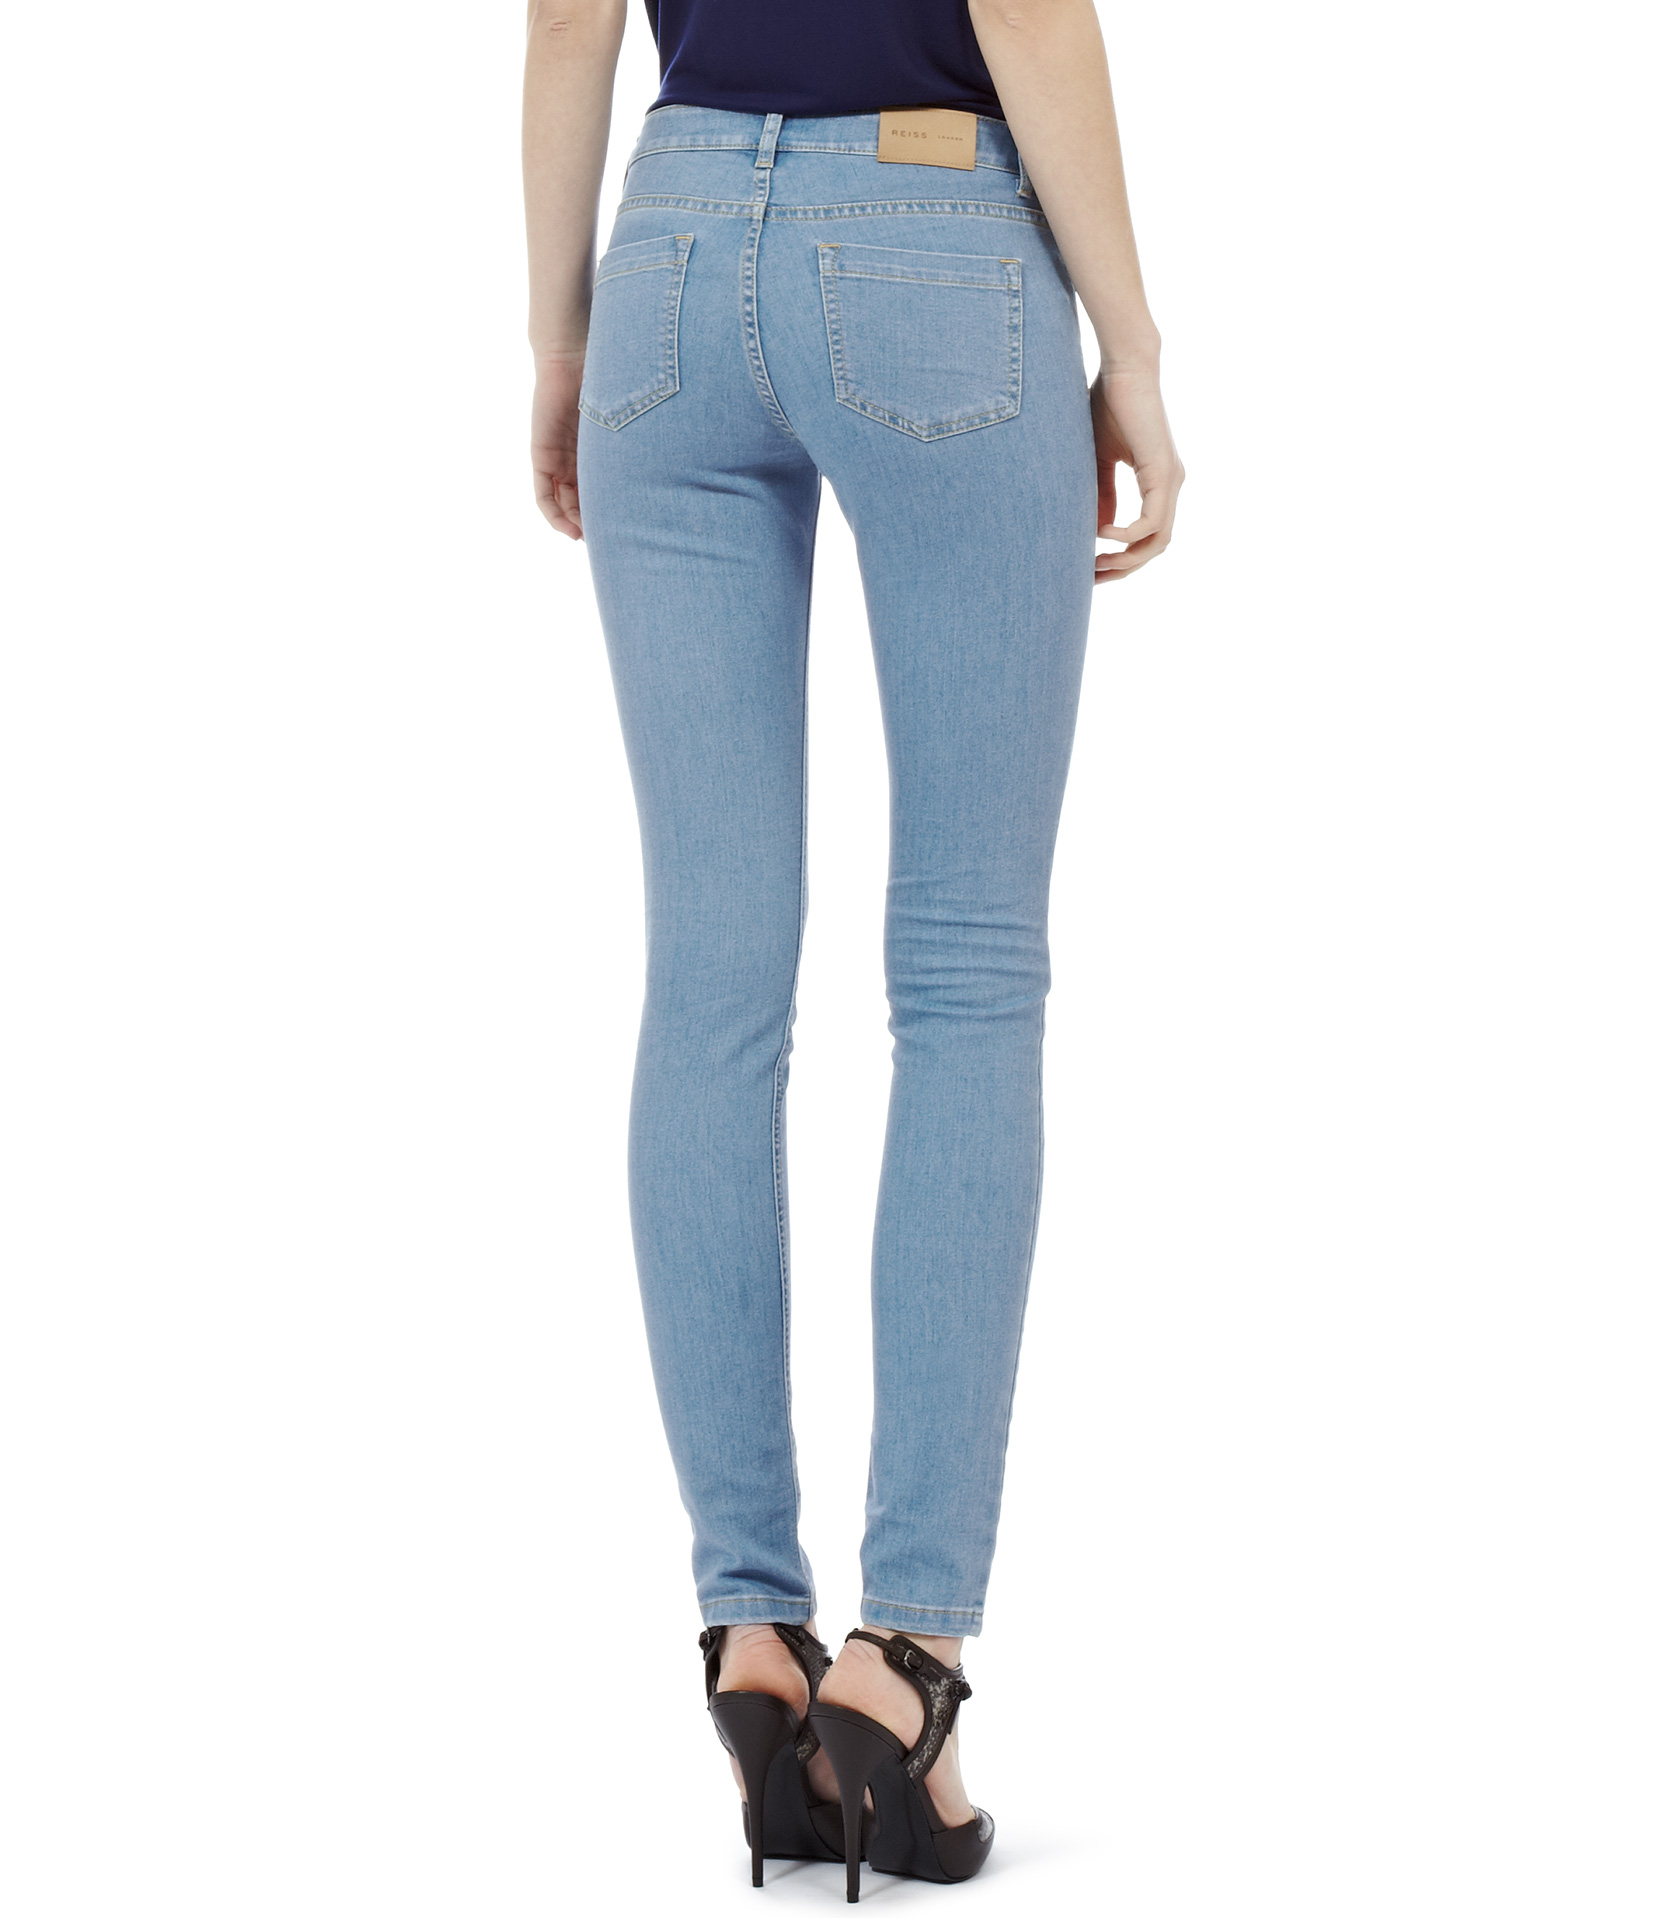 Reiss Smith Denim Skinny Jeans in Blue | Lyst